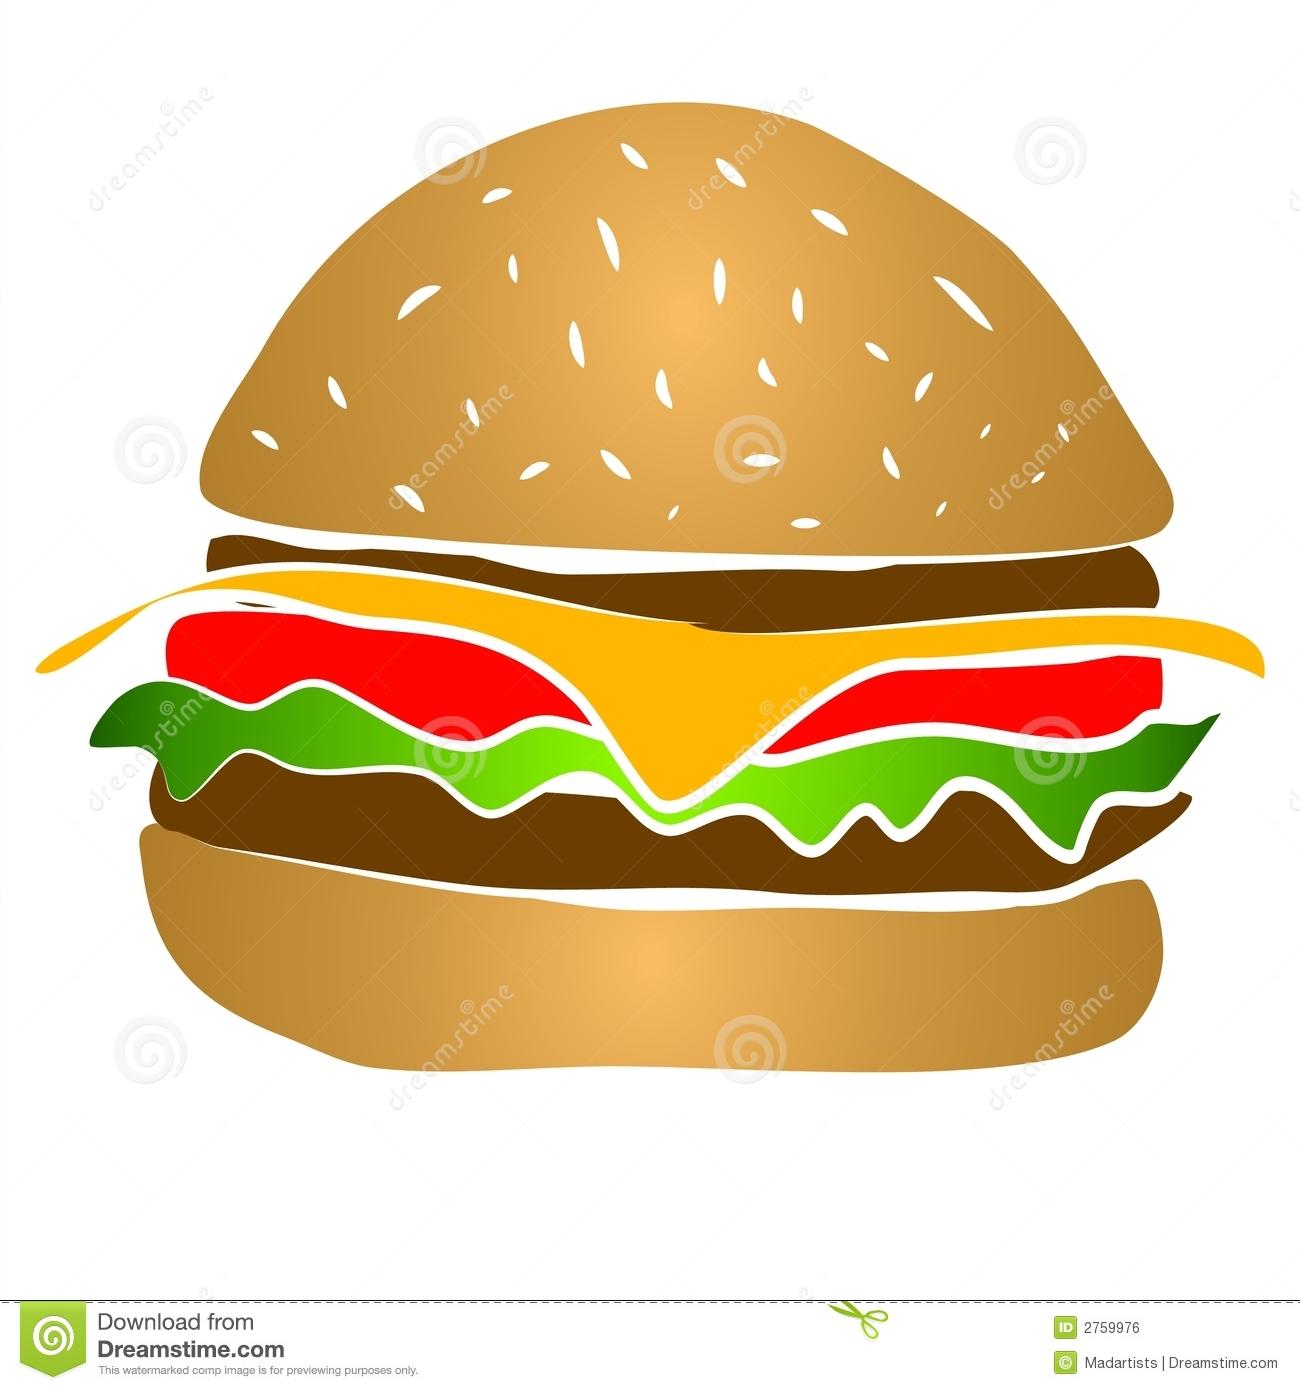 Burgers free download best. Burger clipart face